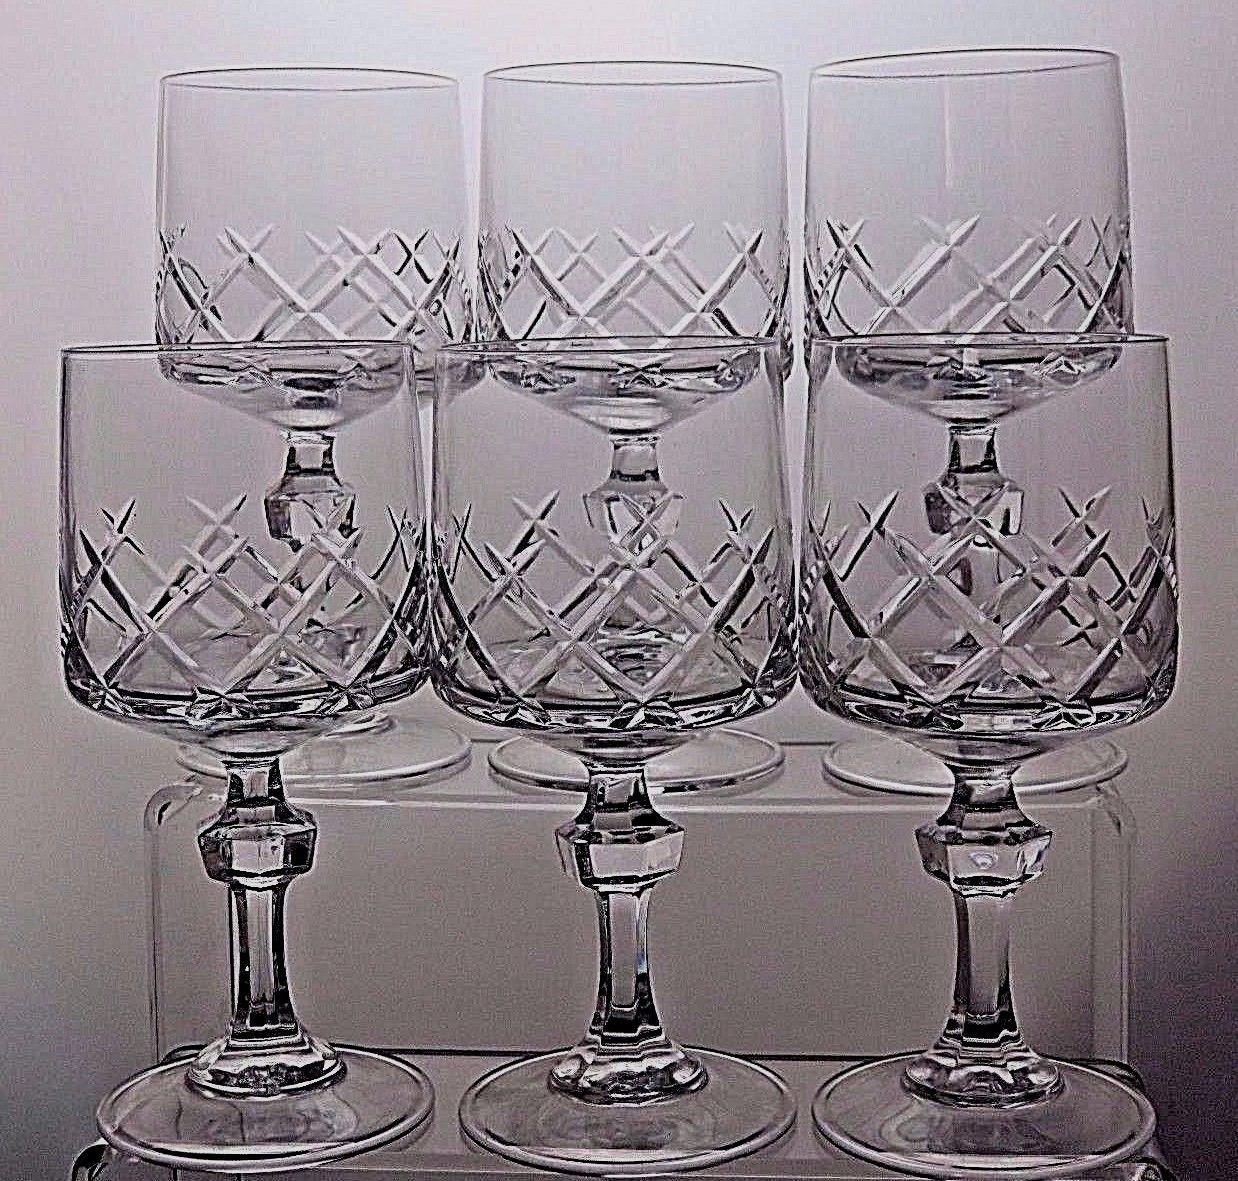 Bohemia Bohemian Crystal Large Cut Wine Gles Set Of 6 1 3 Tall